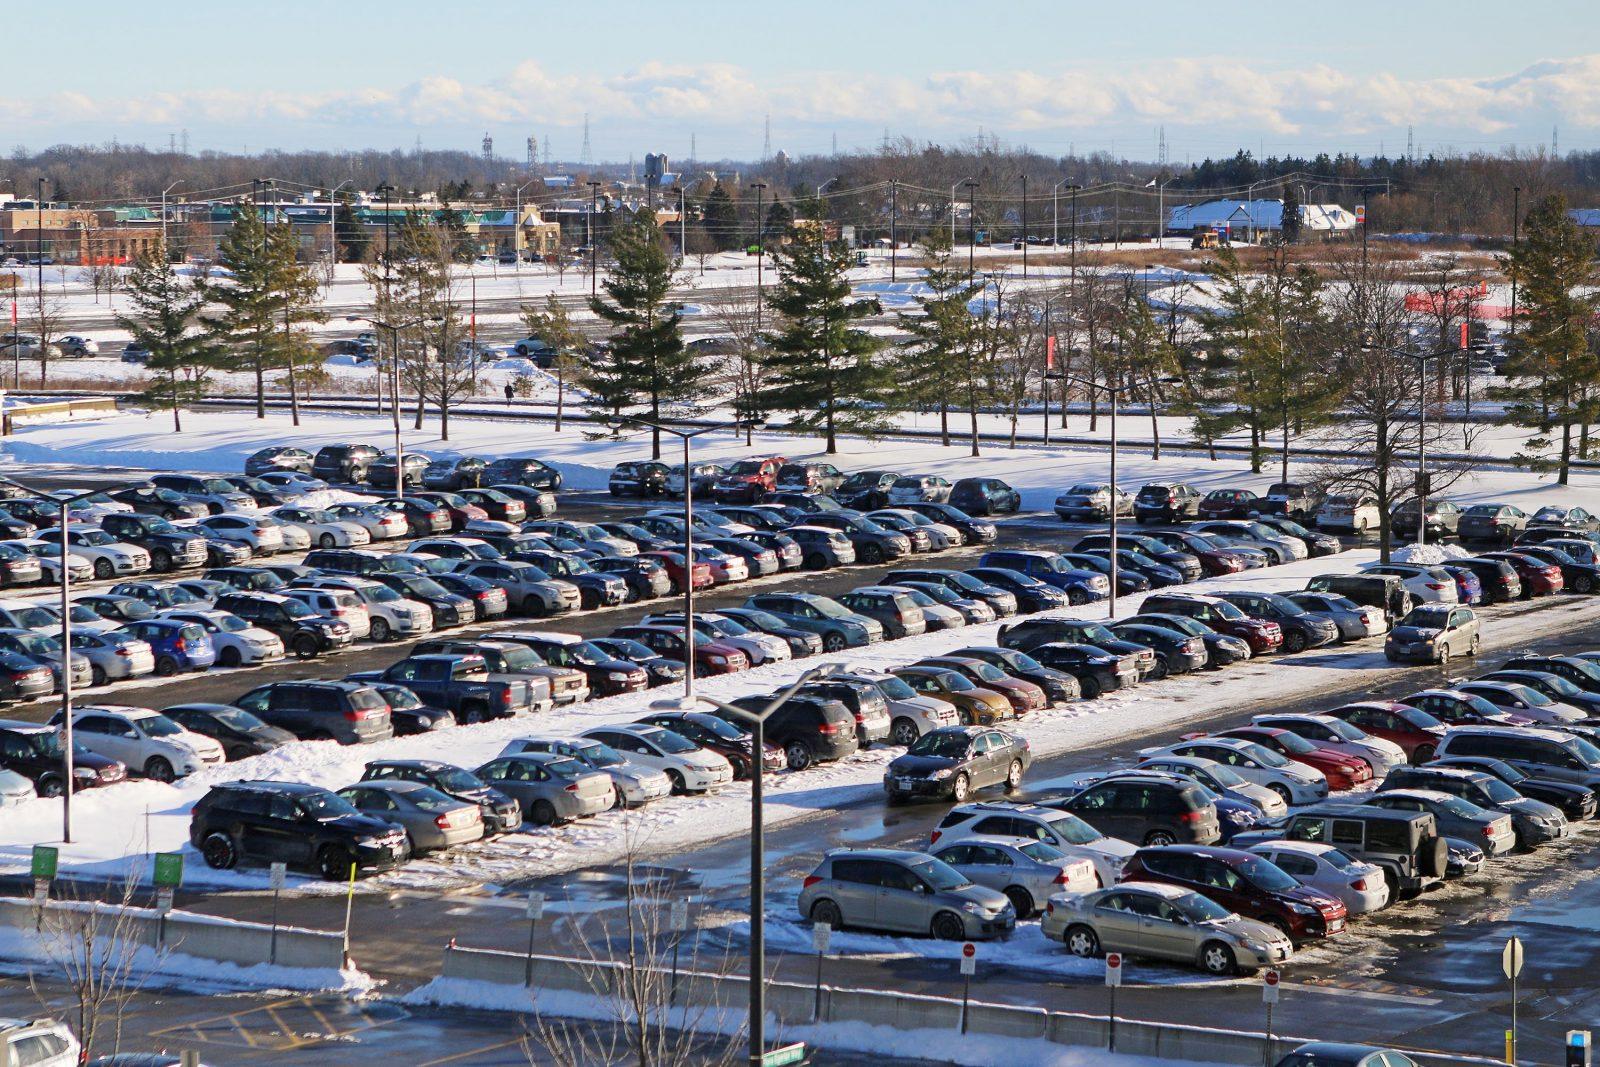 Winter parking lot